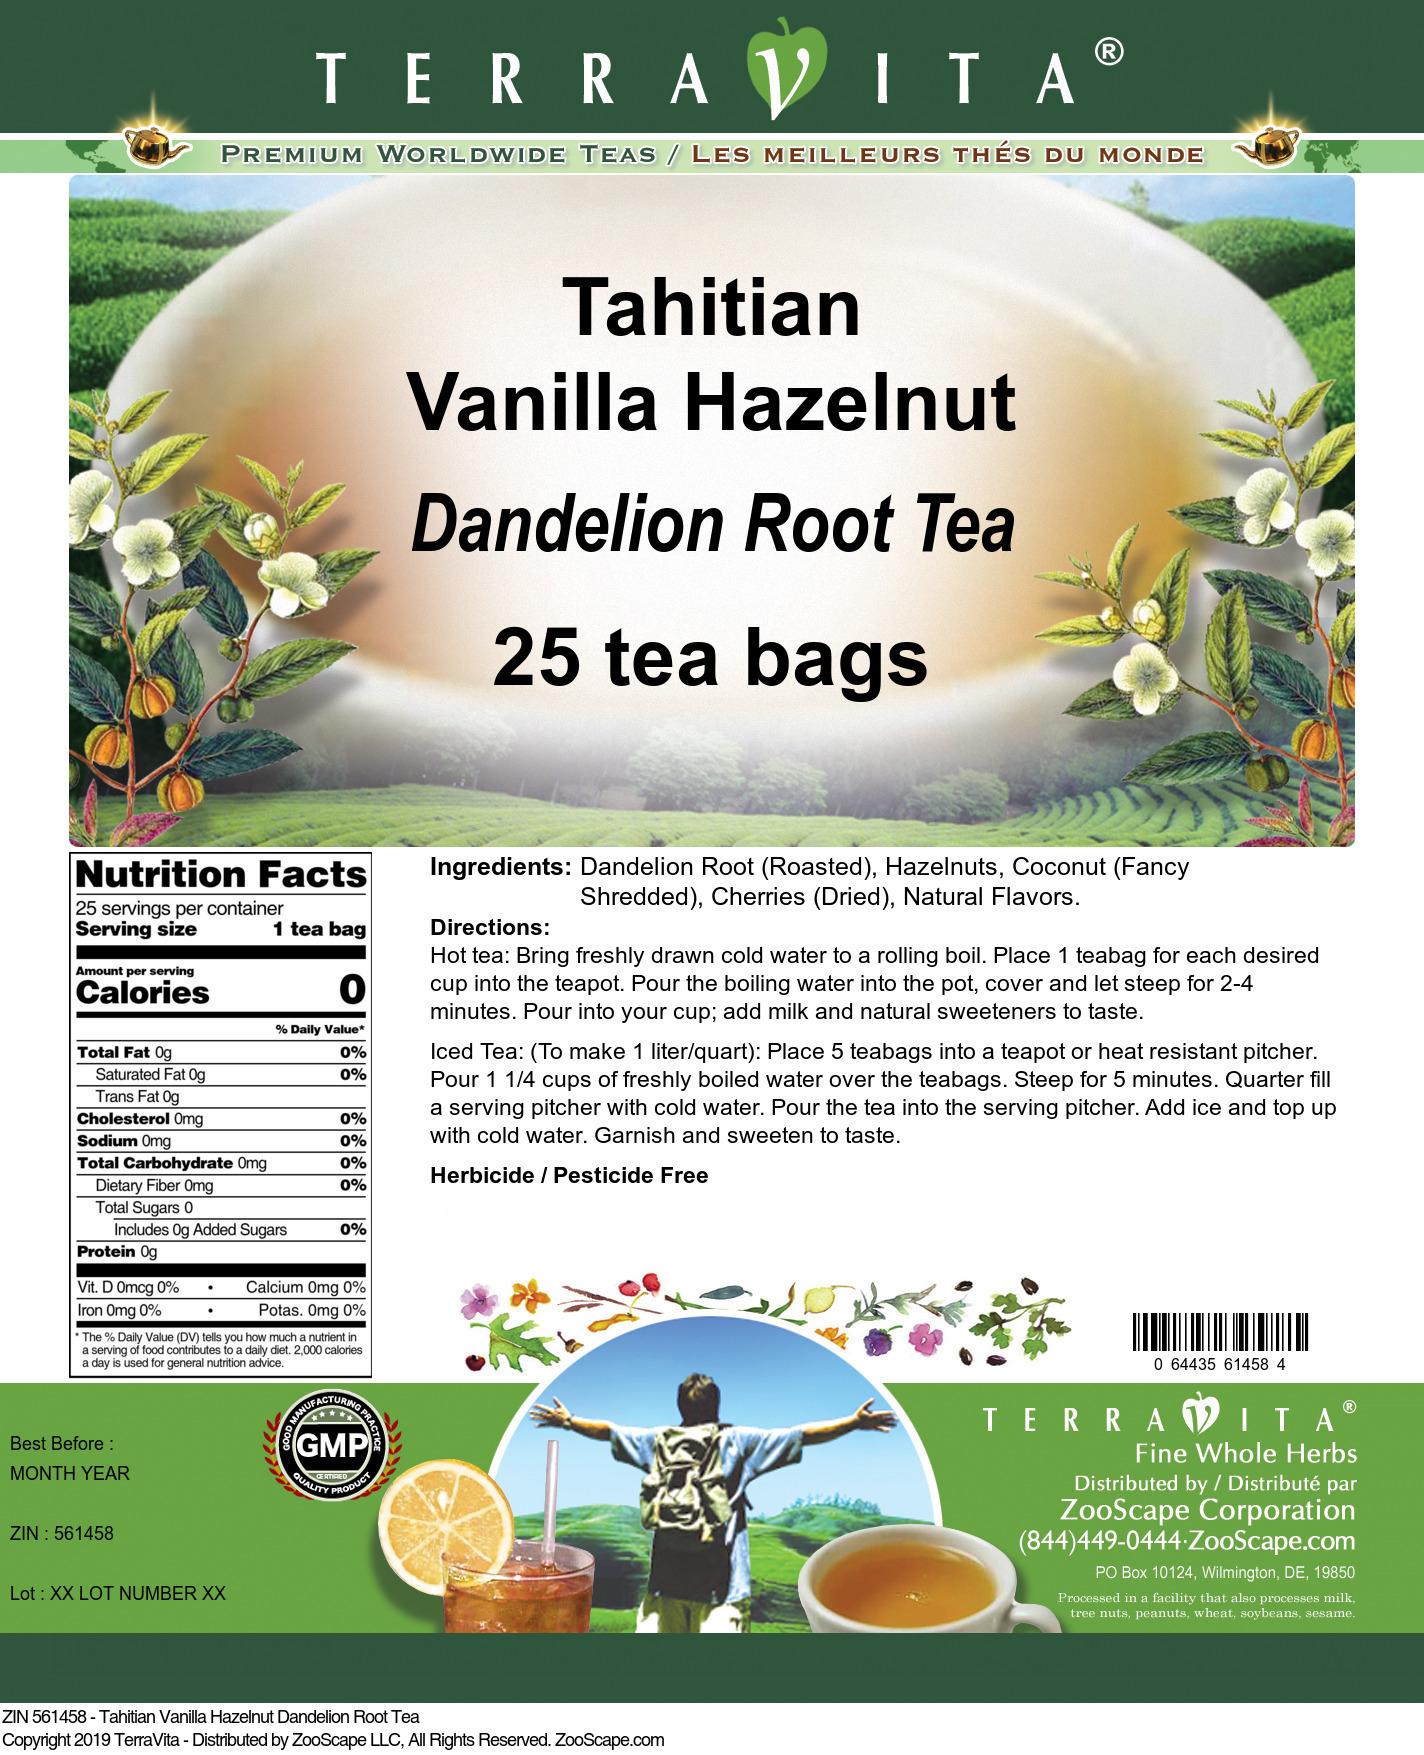 Tahitian Vanilla Hazelnut Dandelion Root